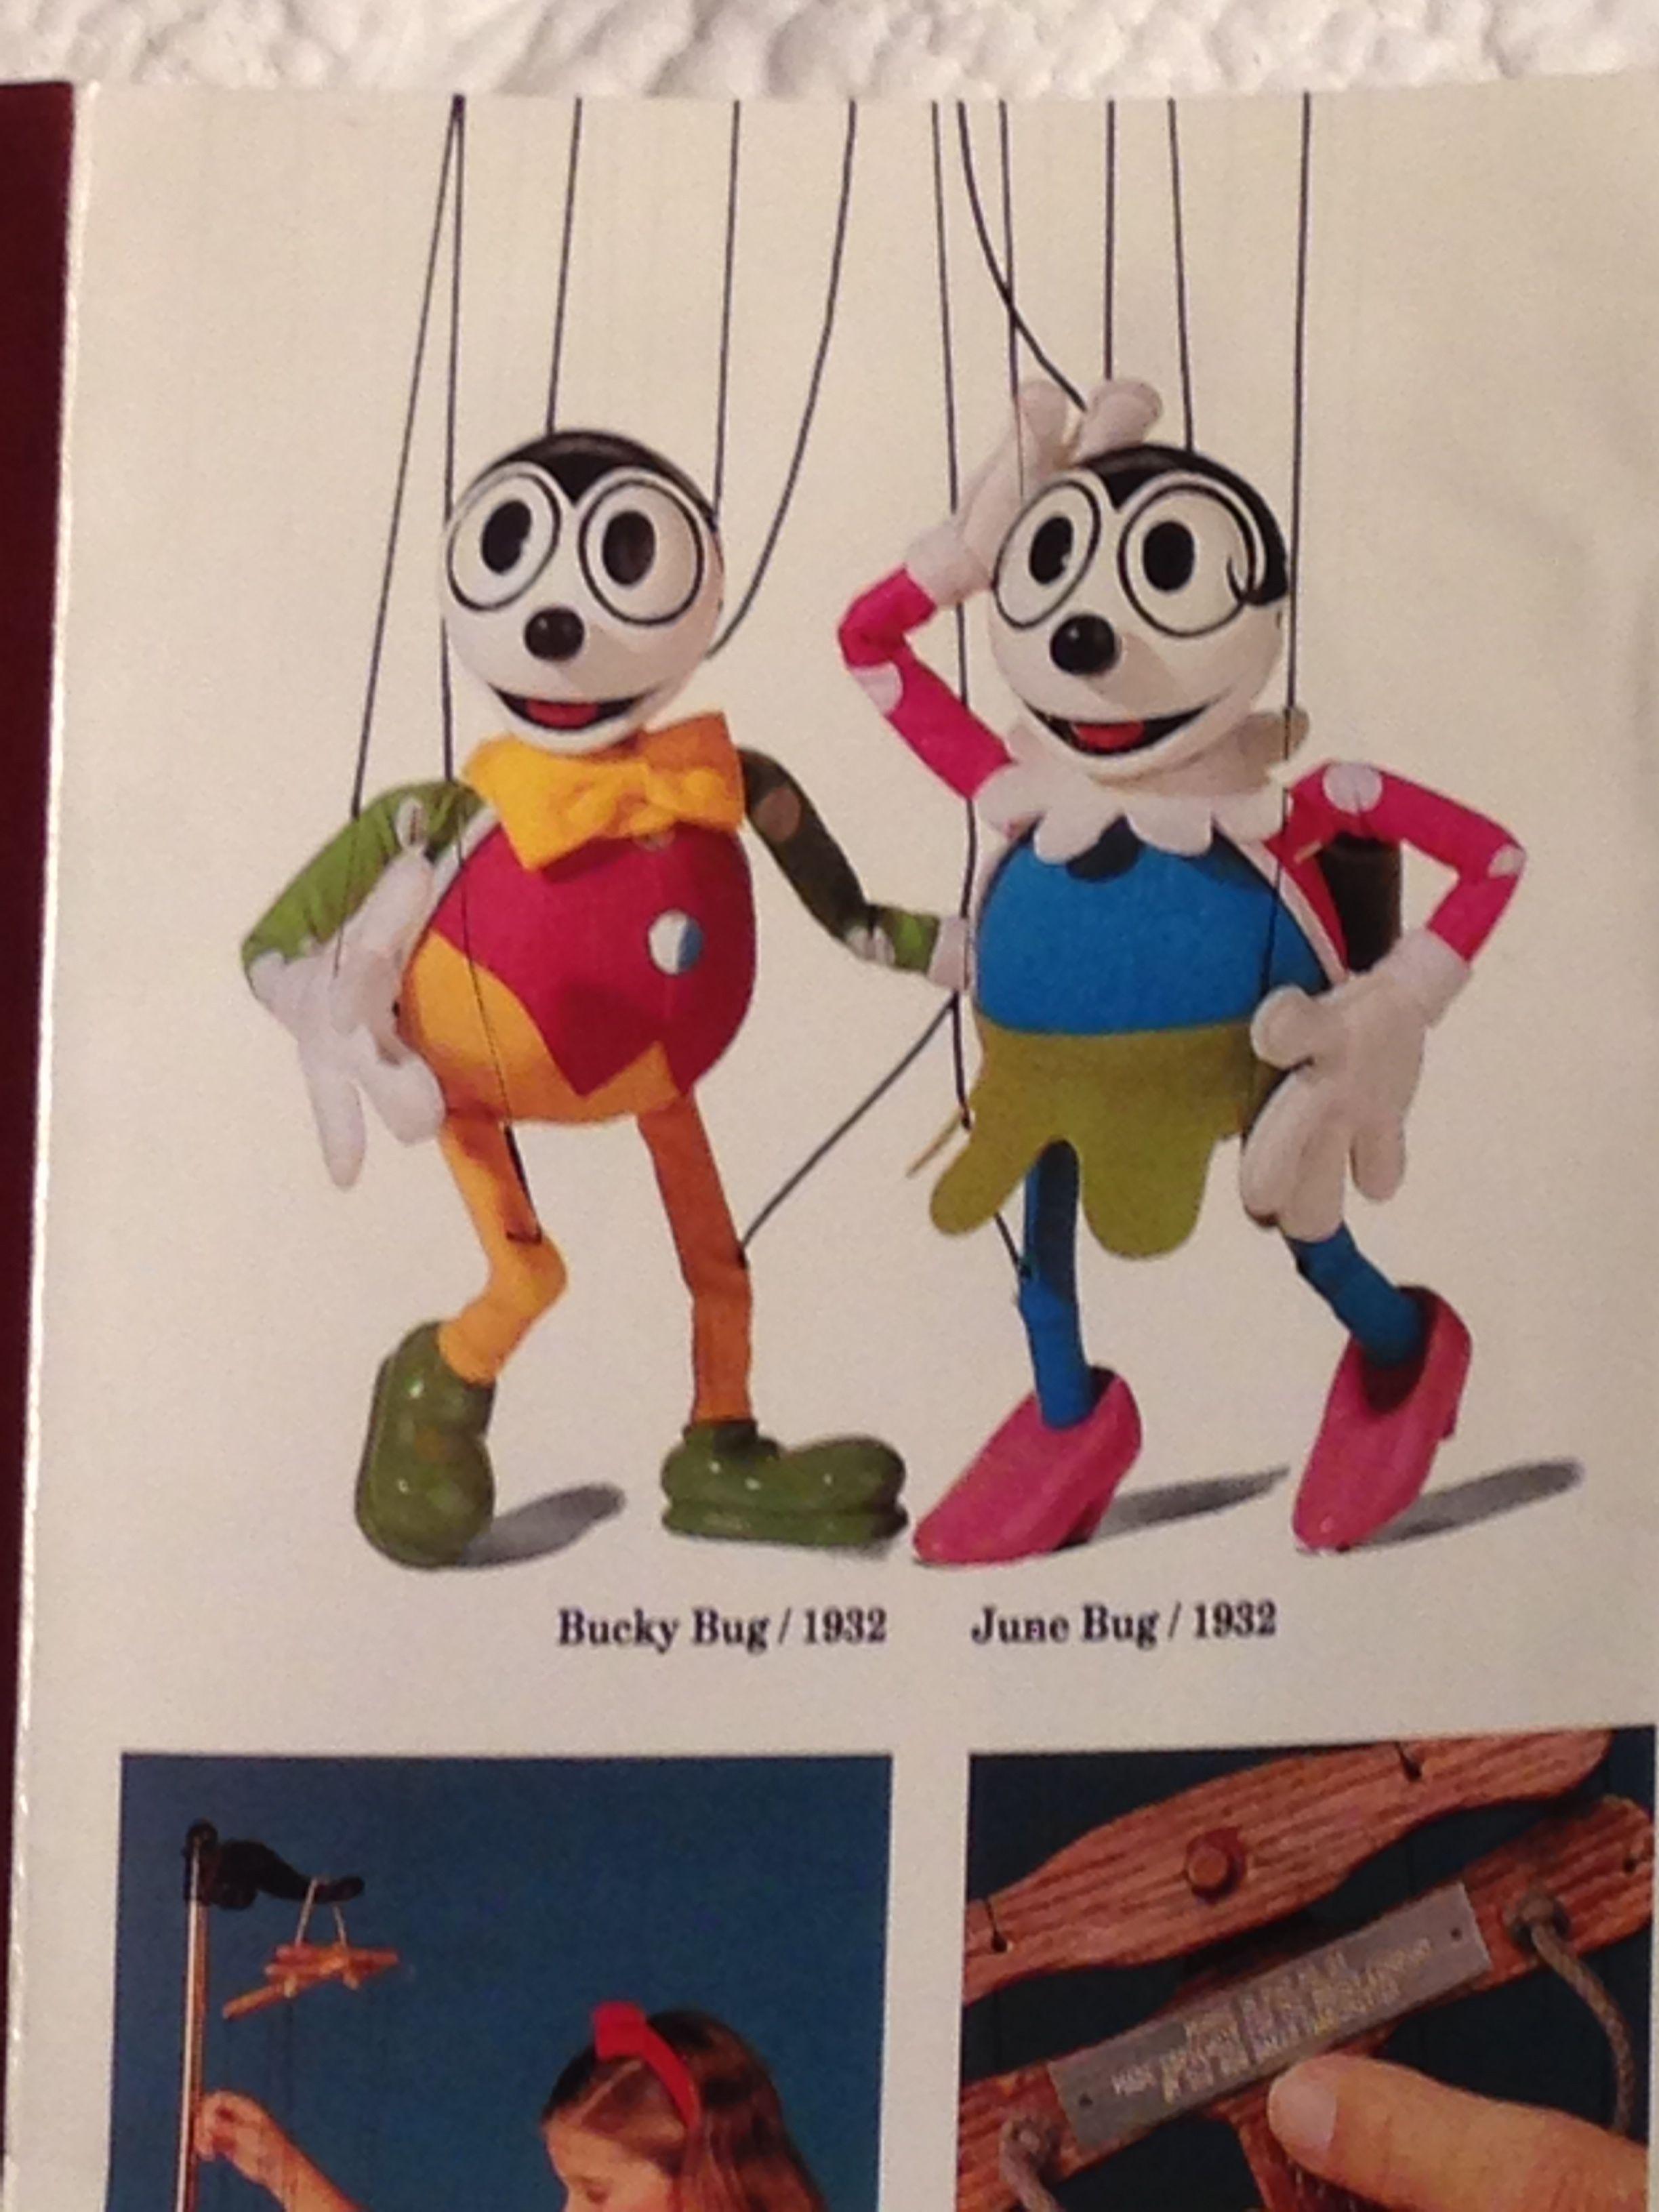 Disney S Bob Baker Marionette Collection Bucky Bug June Bug Disney Olaf The Snowman Disney Characters